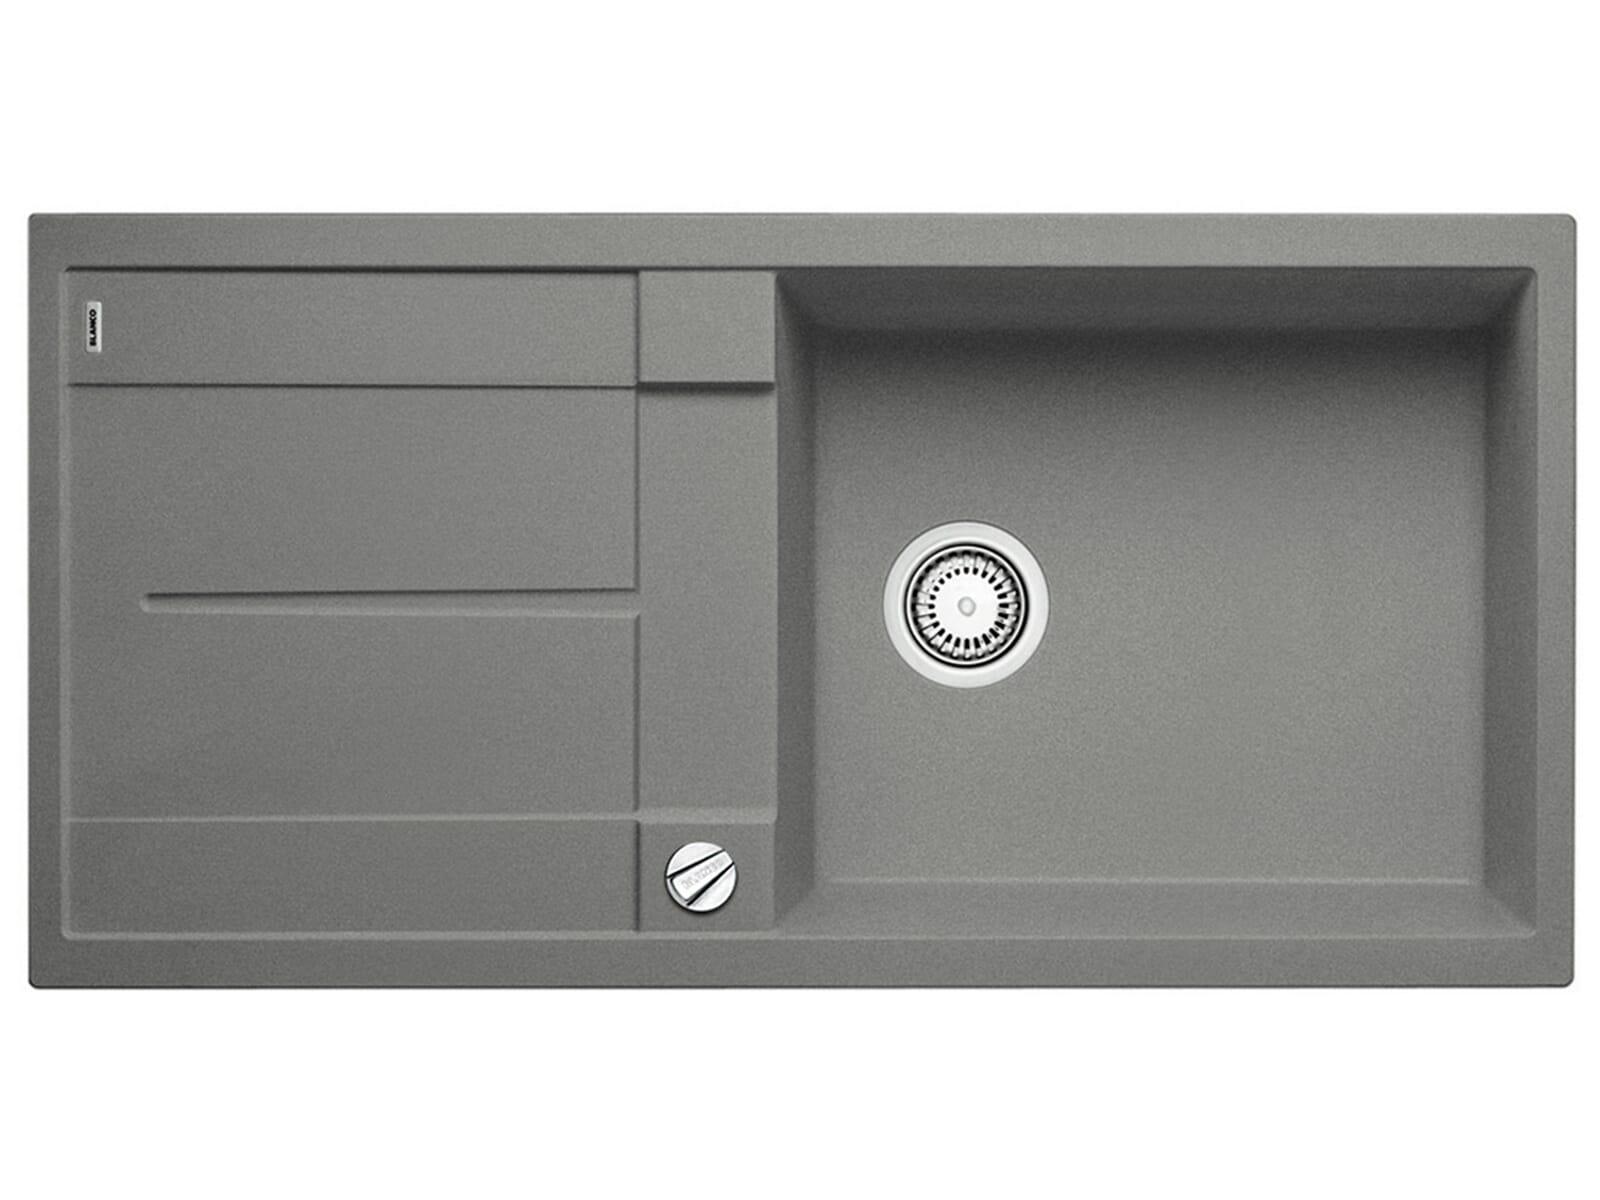 blanco metra xl 6 s alumetallic grau granit einbausp le sp ltisch k chen sp le ebay. Black Bedroom Furniture Sets. Home Design Ideas